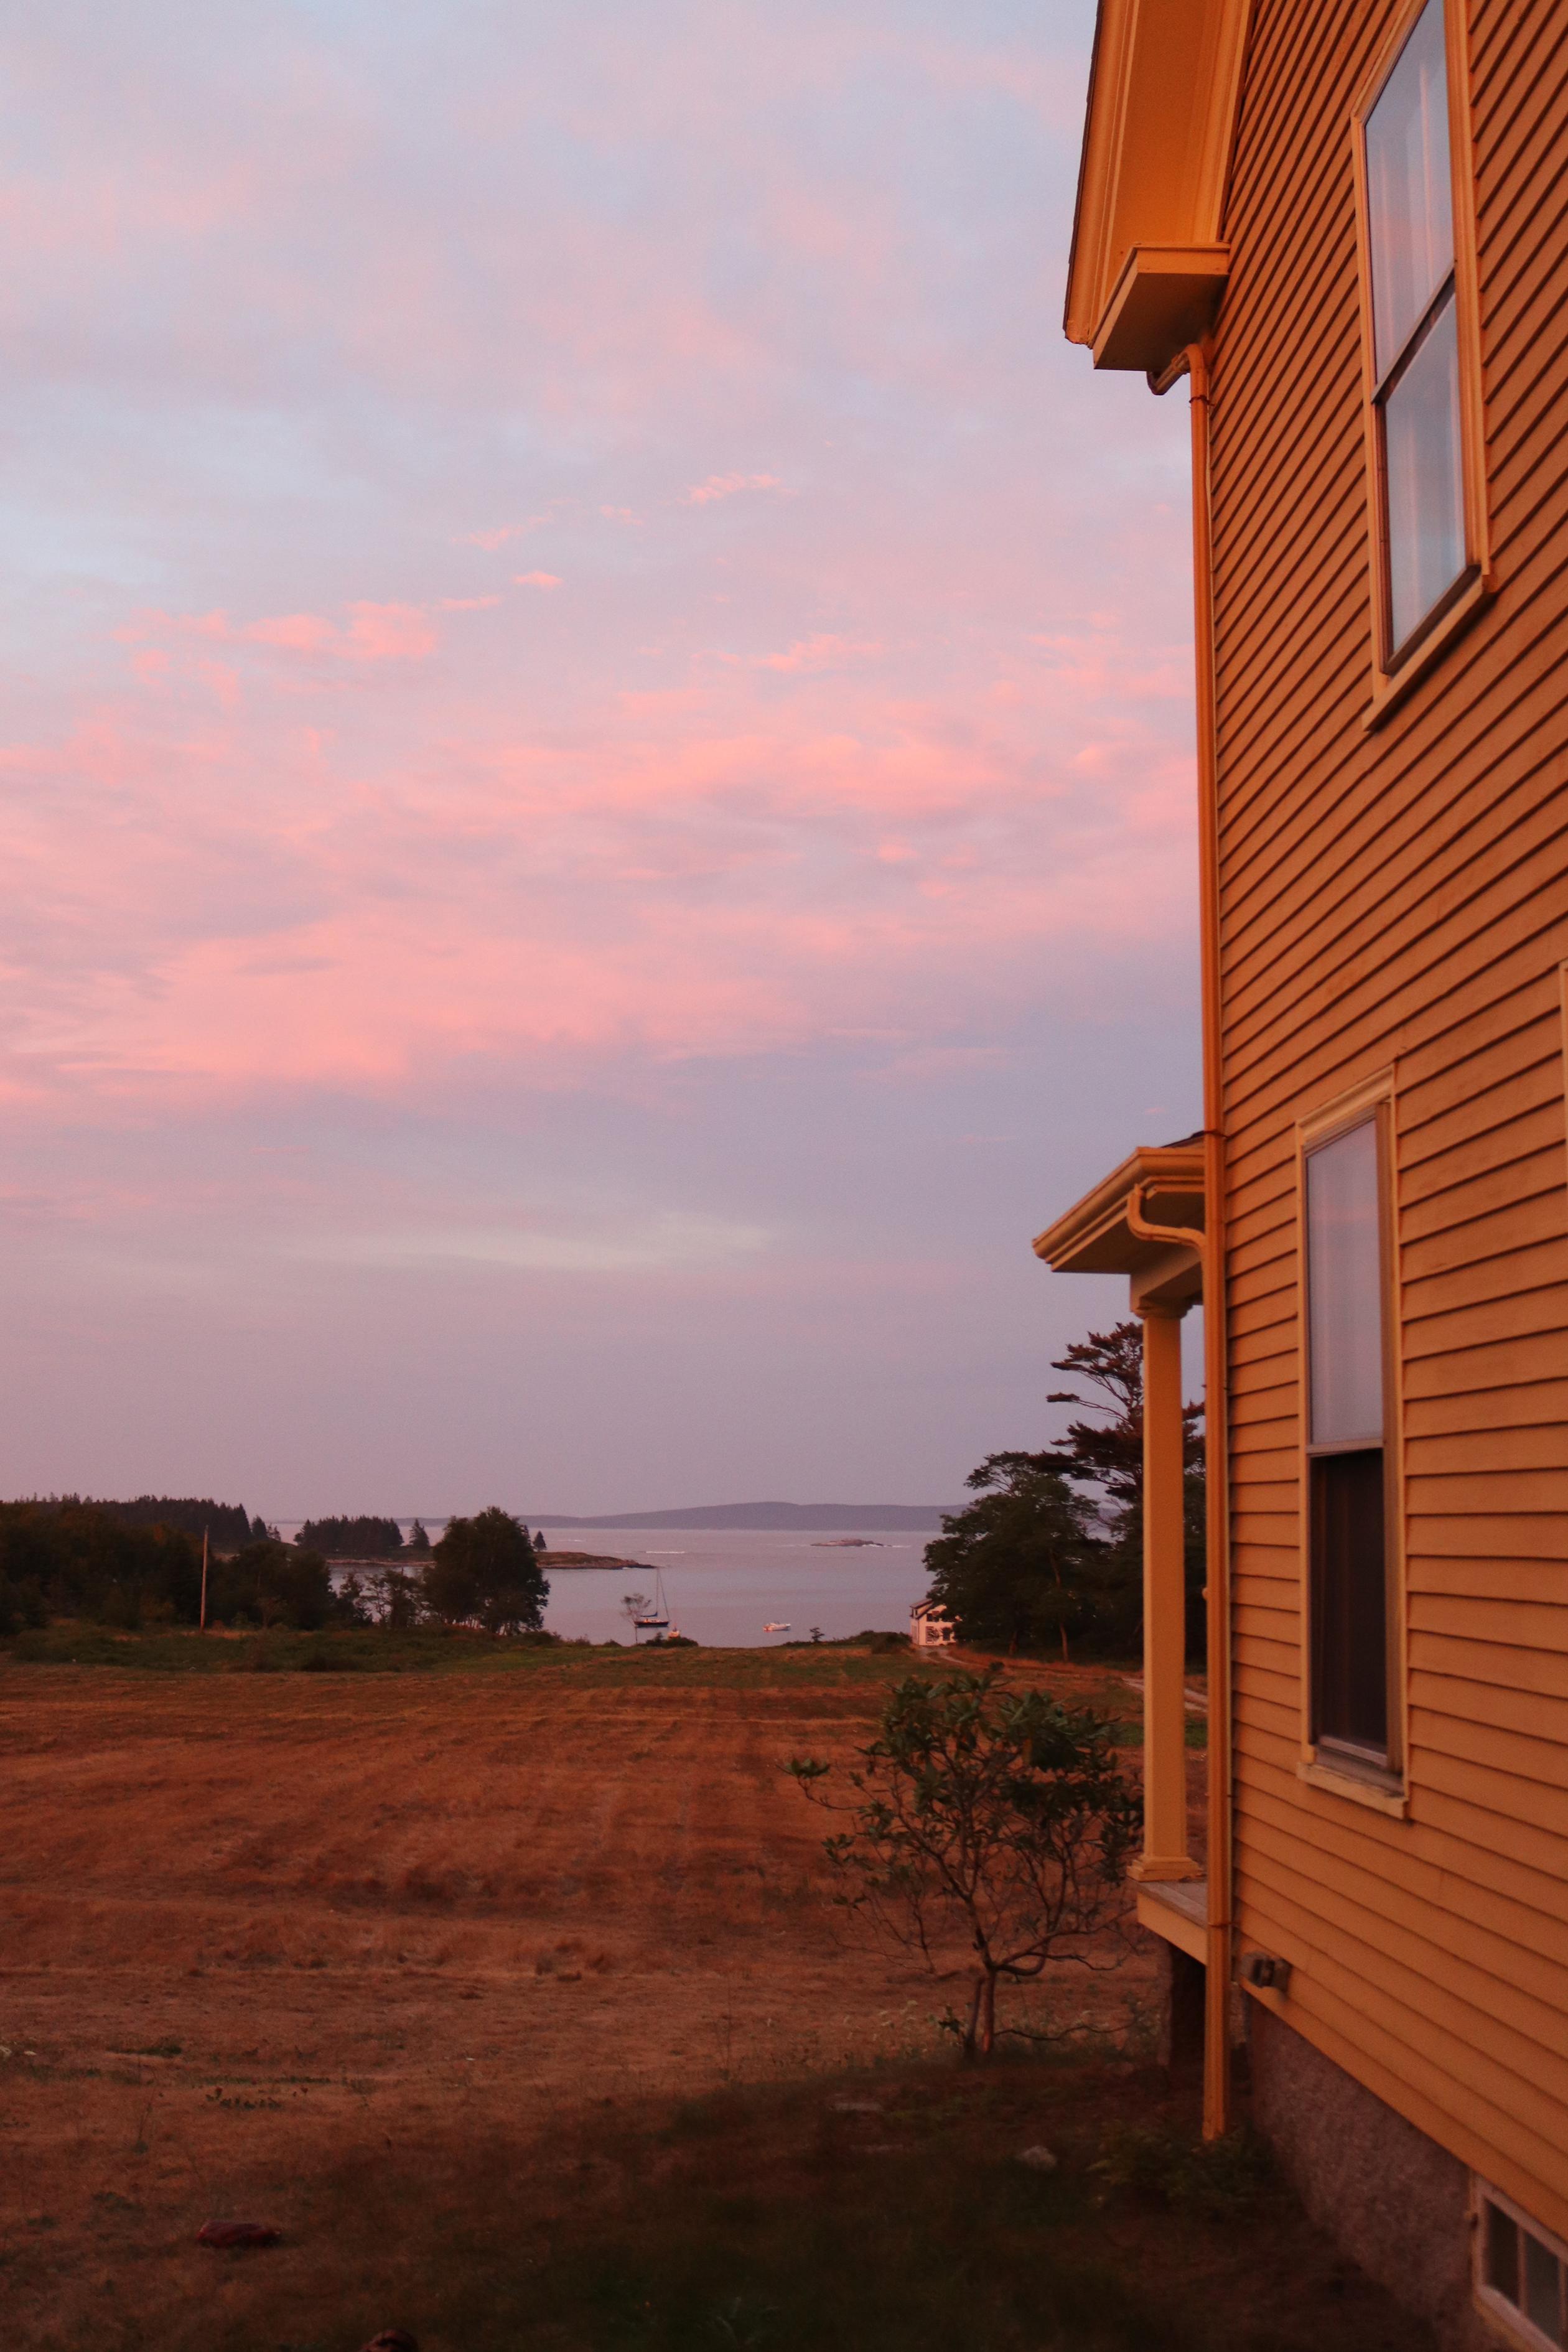 Sunset at the farmhouse